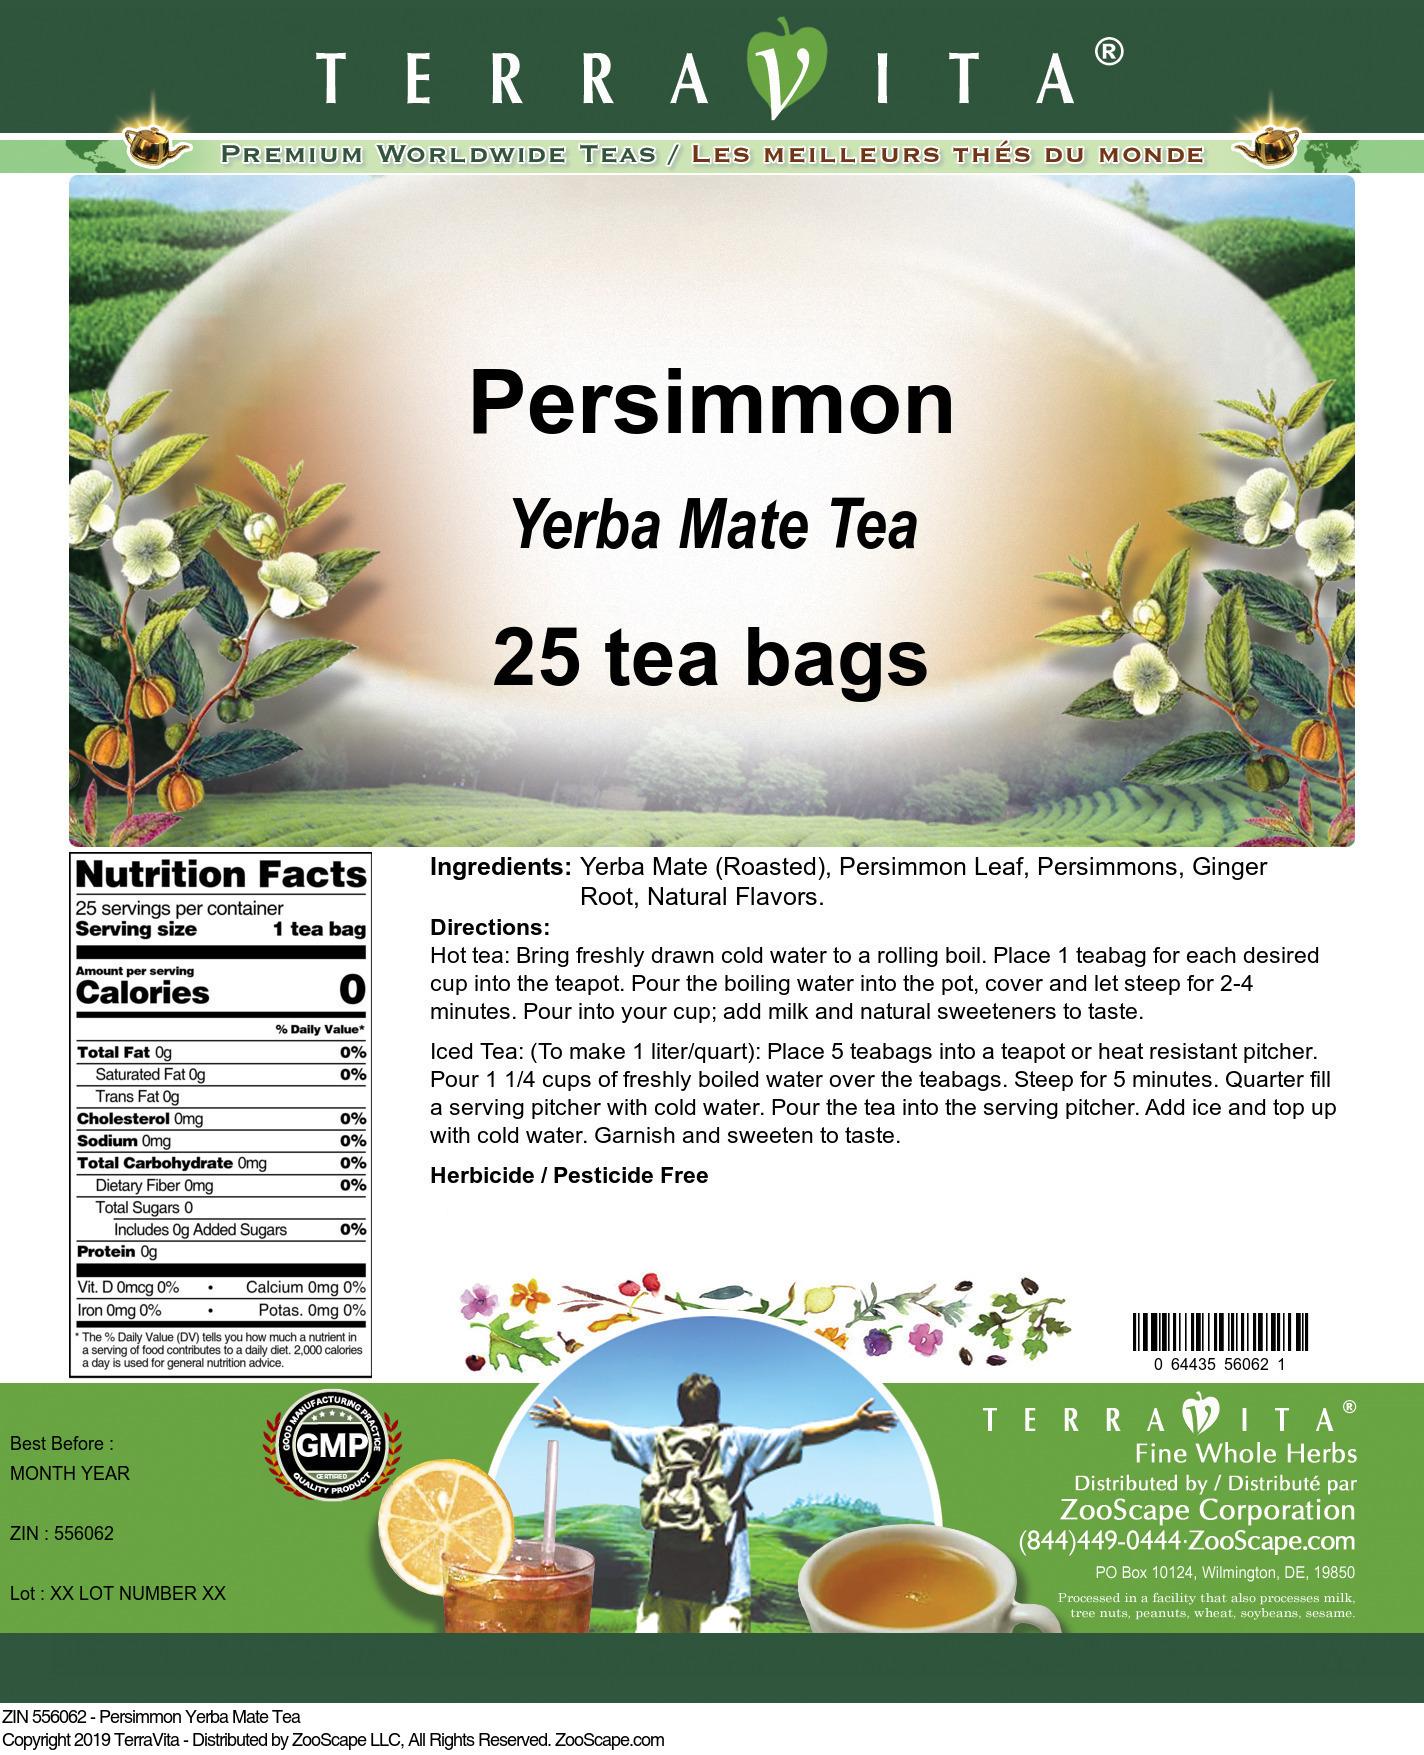 Persimmon Yerba Mate Tea